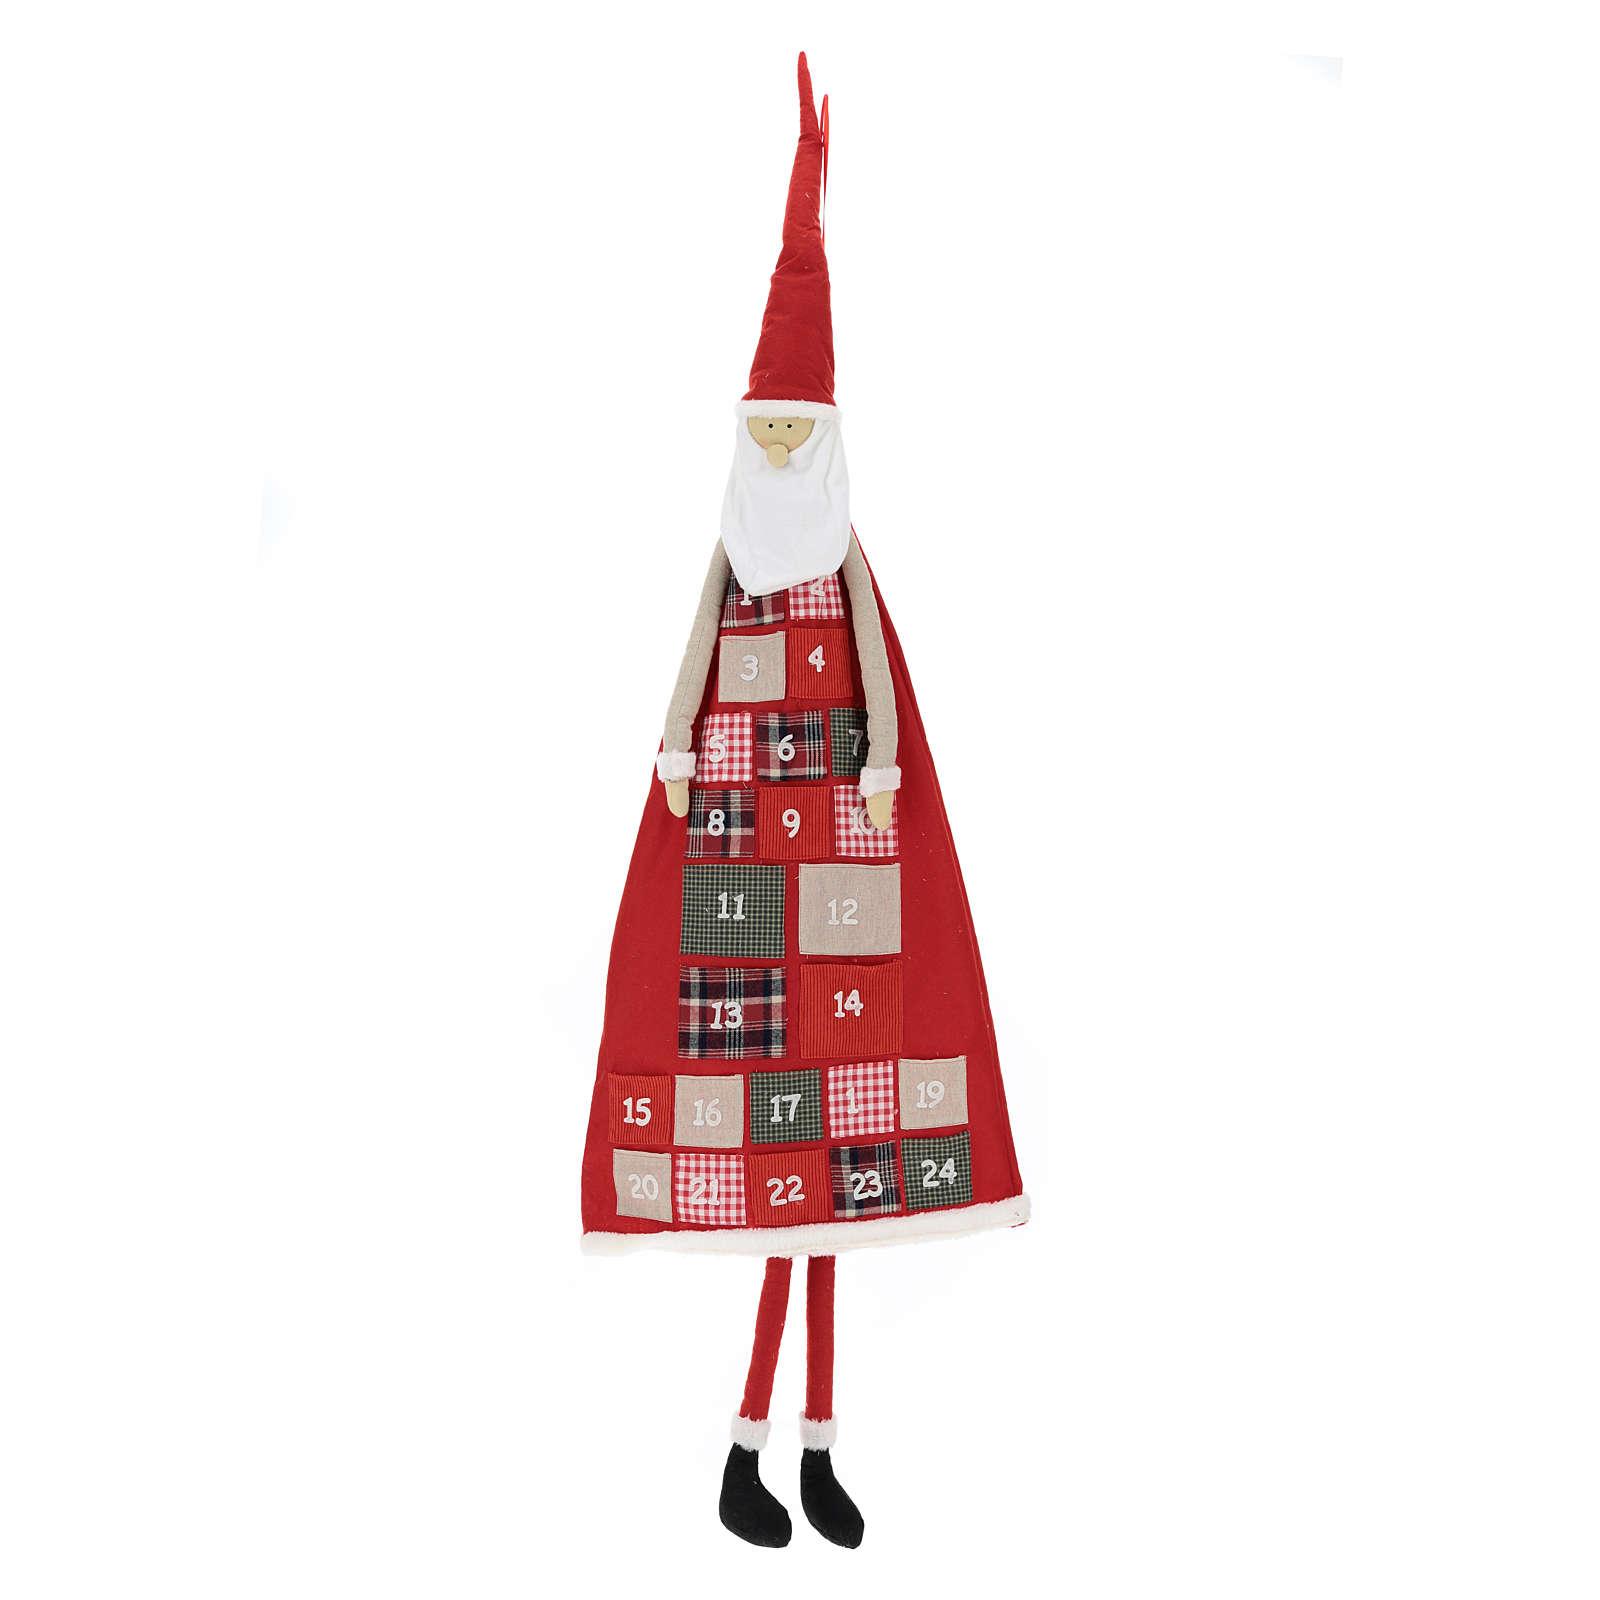 Advent Calendar150 cm in the shape of Santa Claus 3